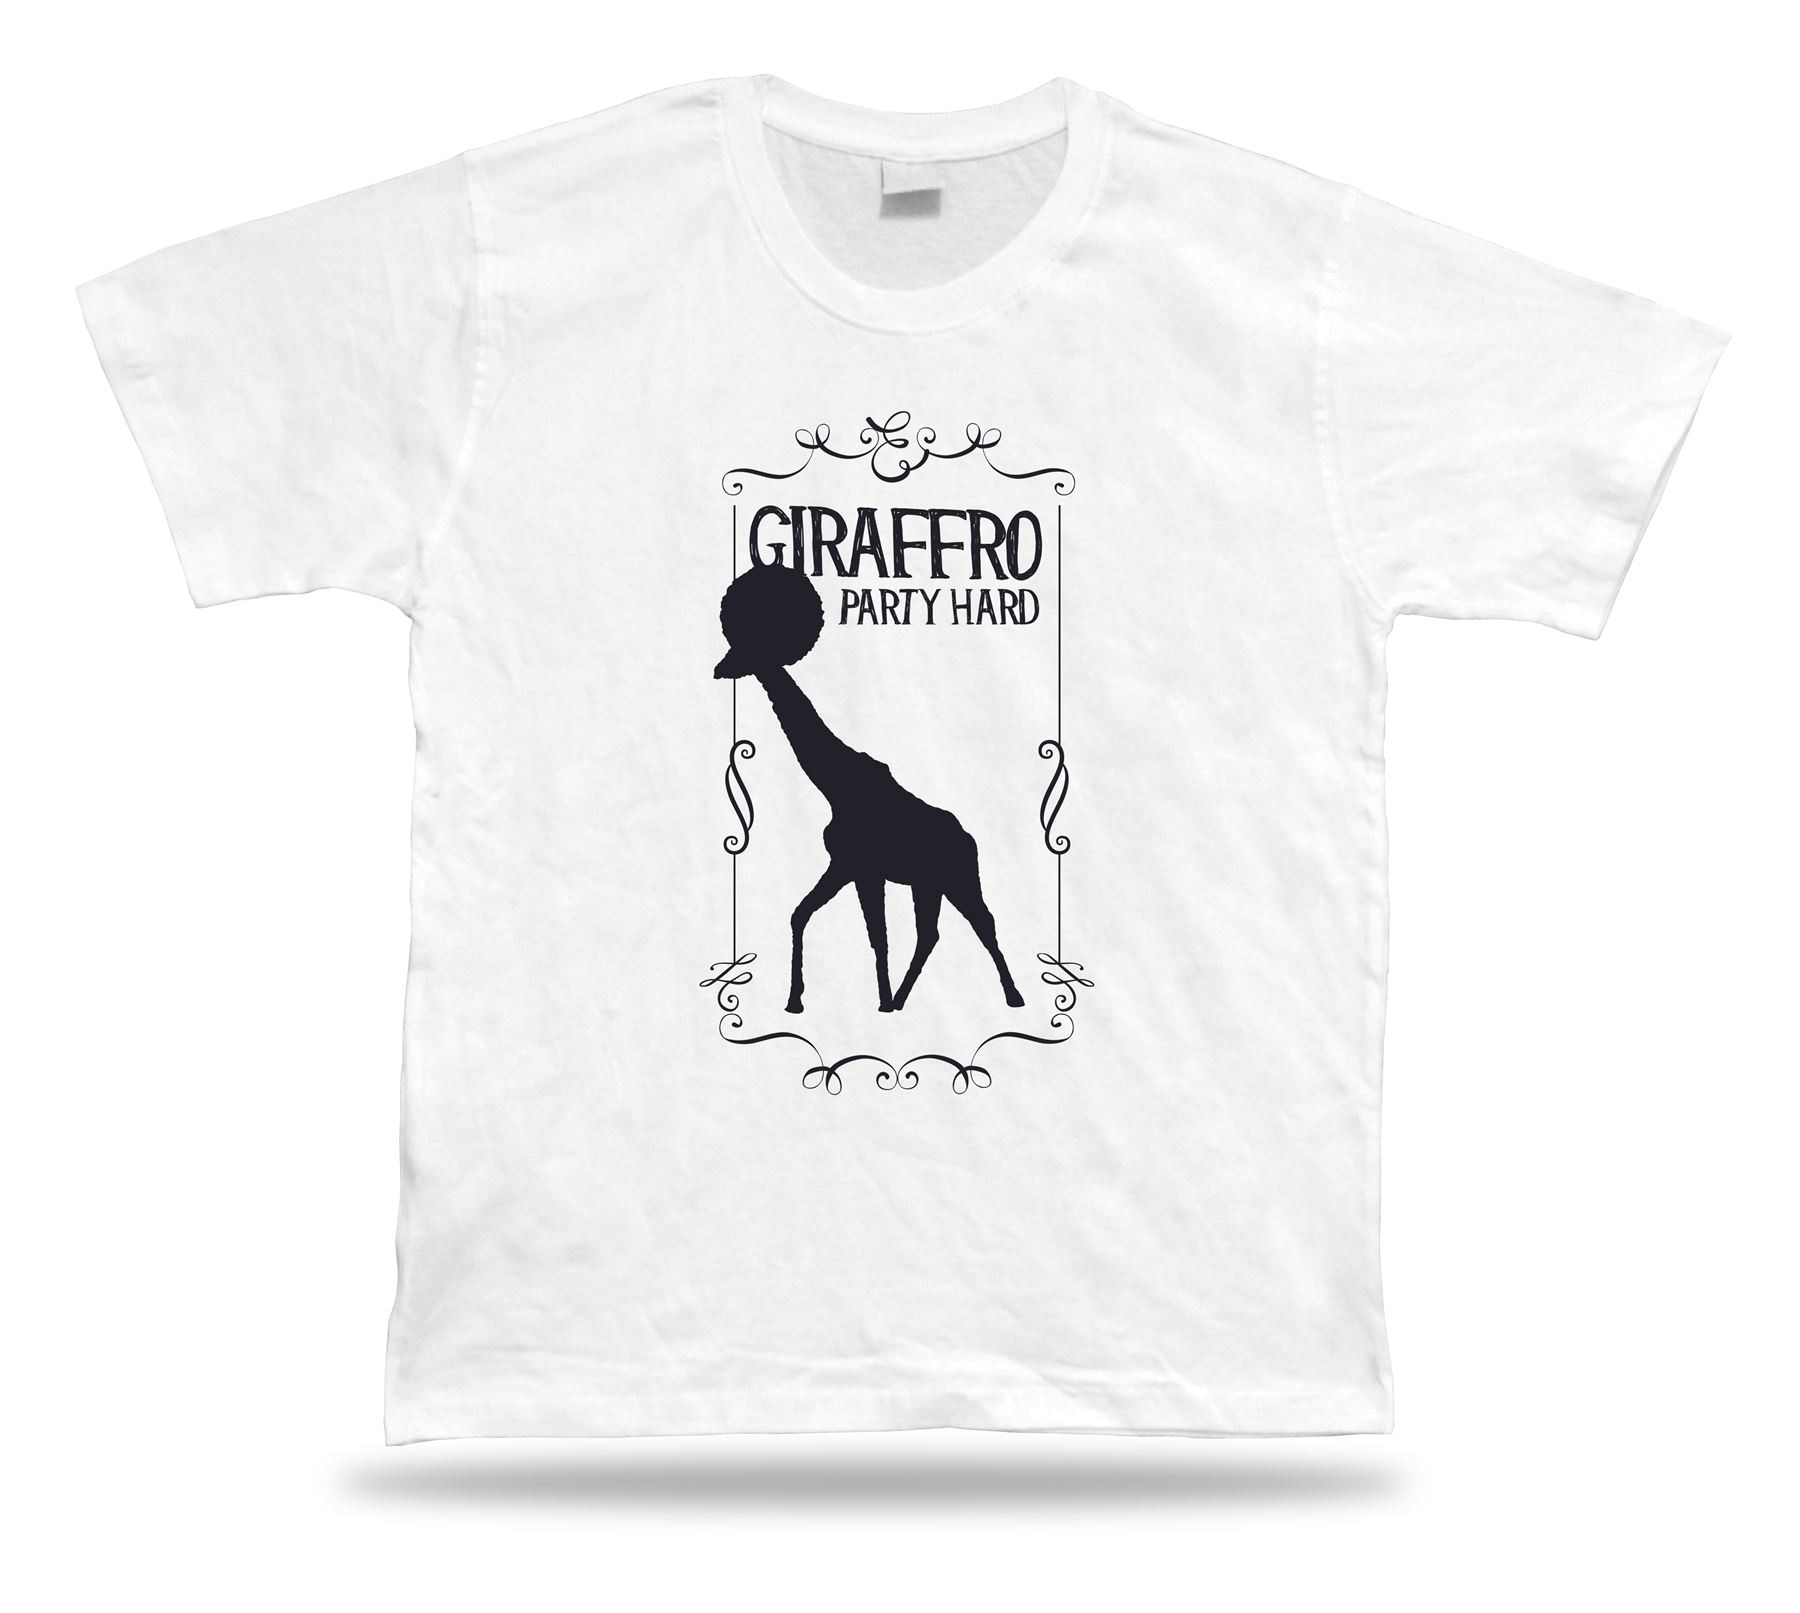 Giraffro party, camiseta moderna con estilo de vector duro, diseño de idea, ropa de dibujos animados, camiseta para hombres, nueva camiseta de moda Unisex